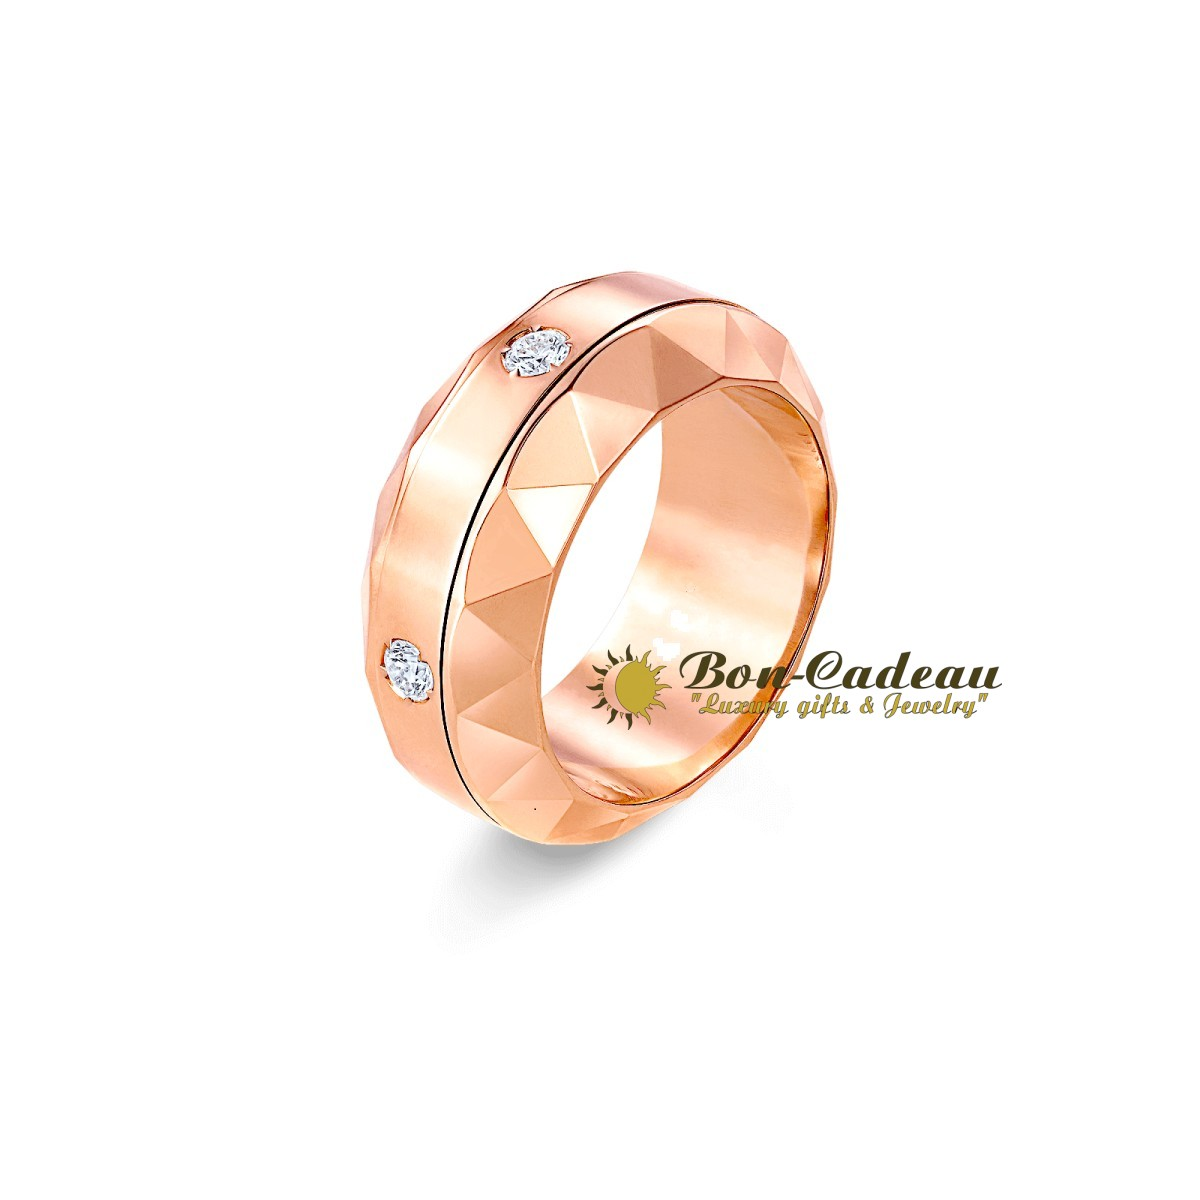 Вращающееся кольцо с крутящимся центром